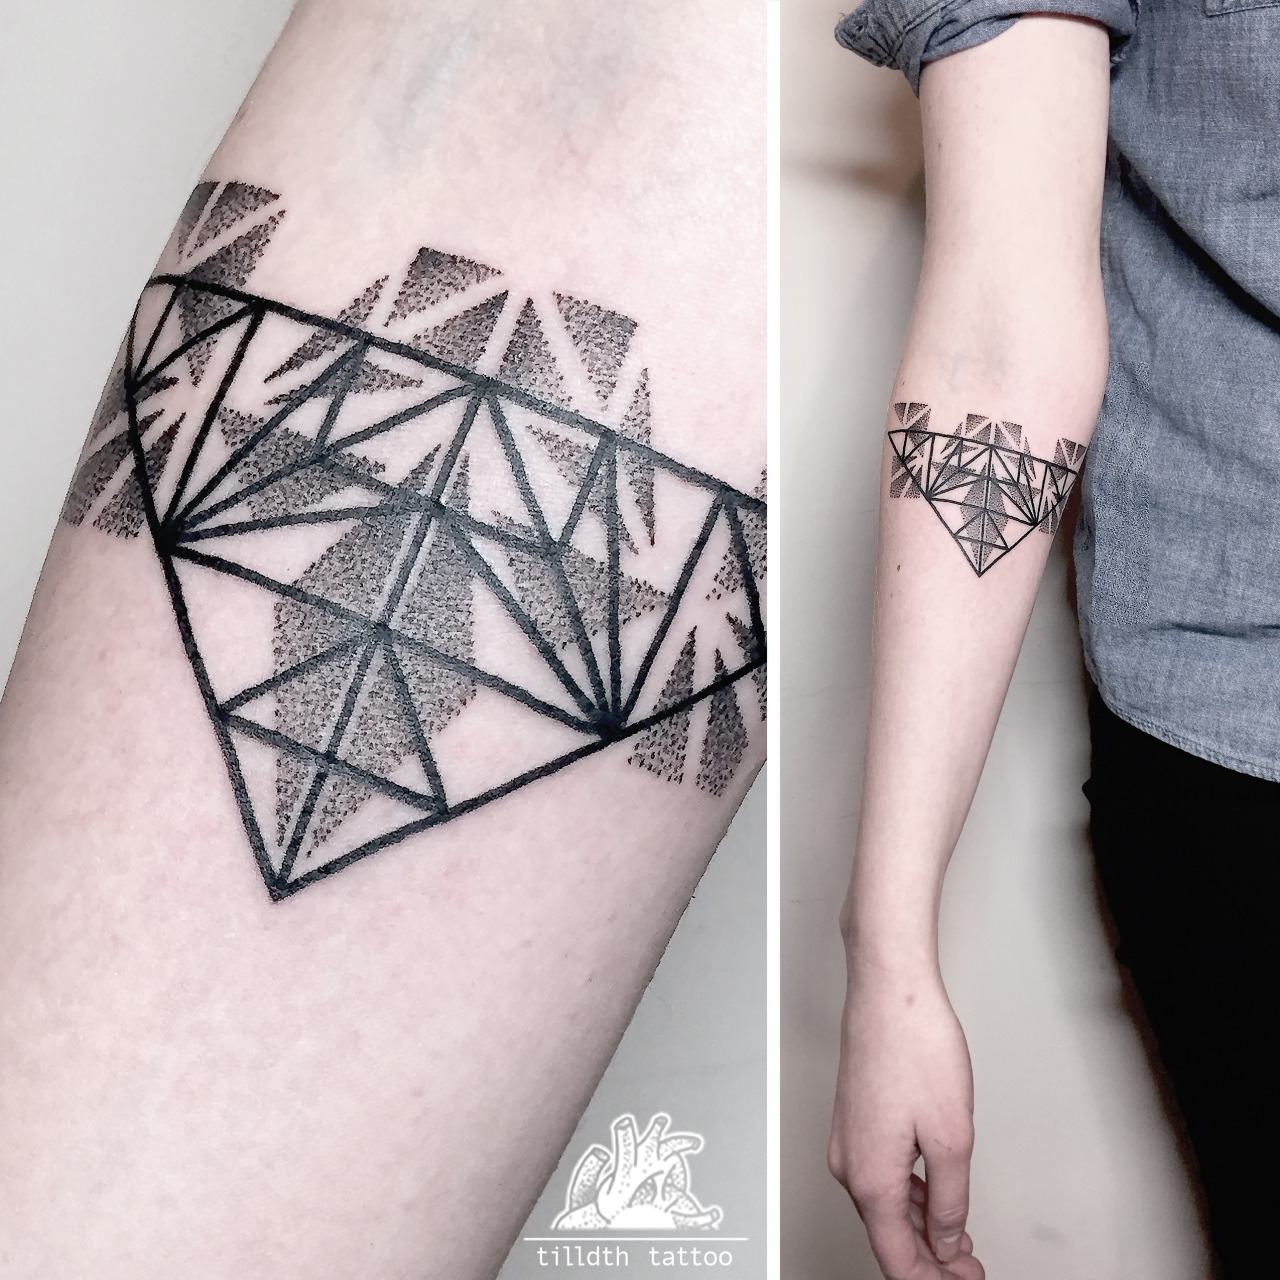 Tilldth Tattoo - the vandallist (11)